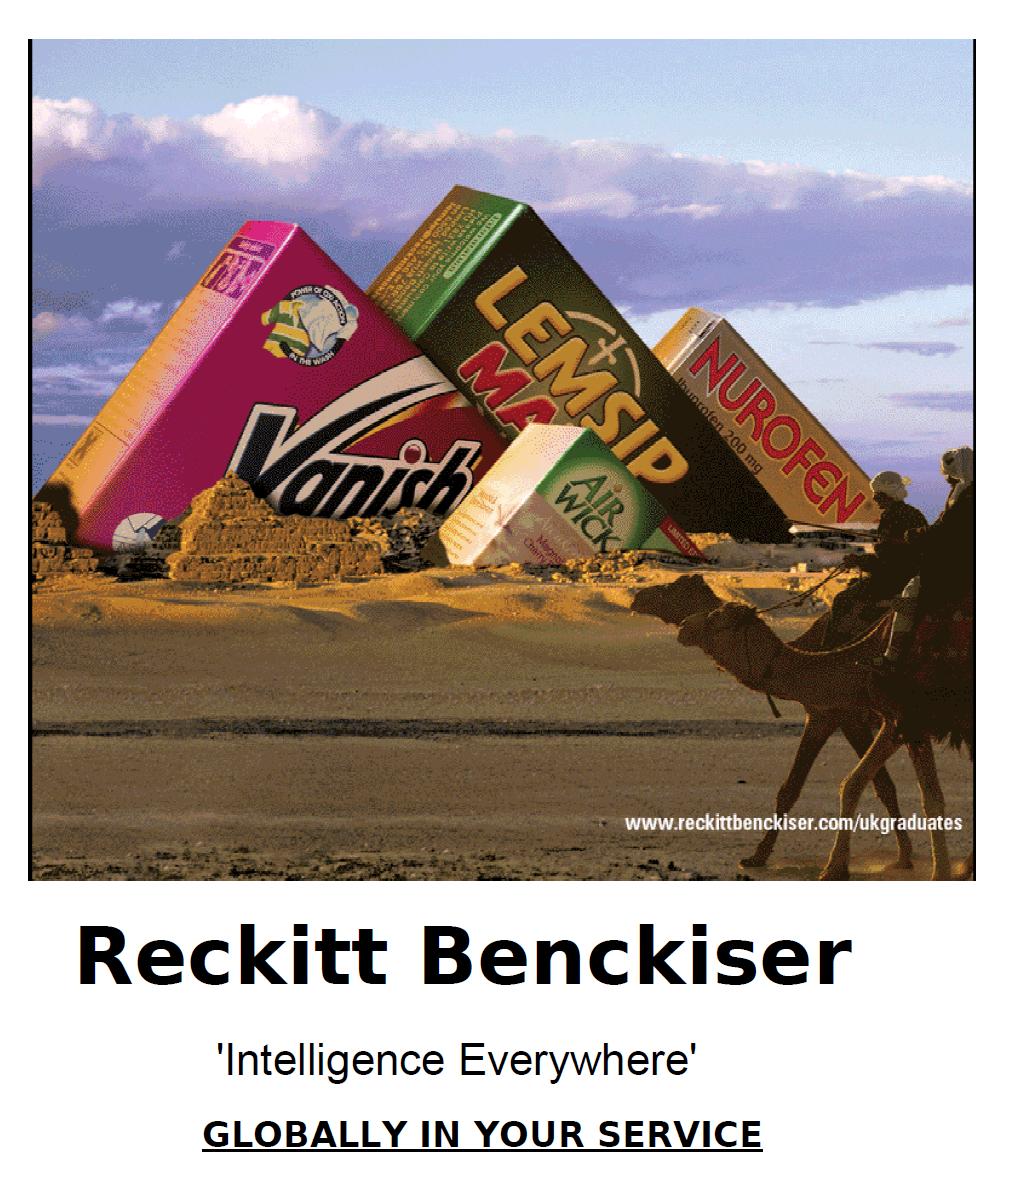 M1batch10 12 Analysis Of Reckitt Benckiser